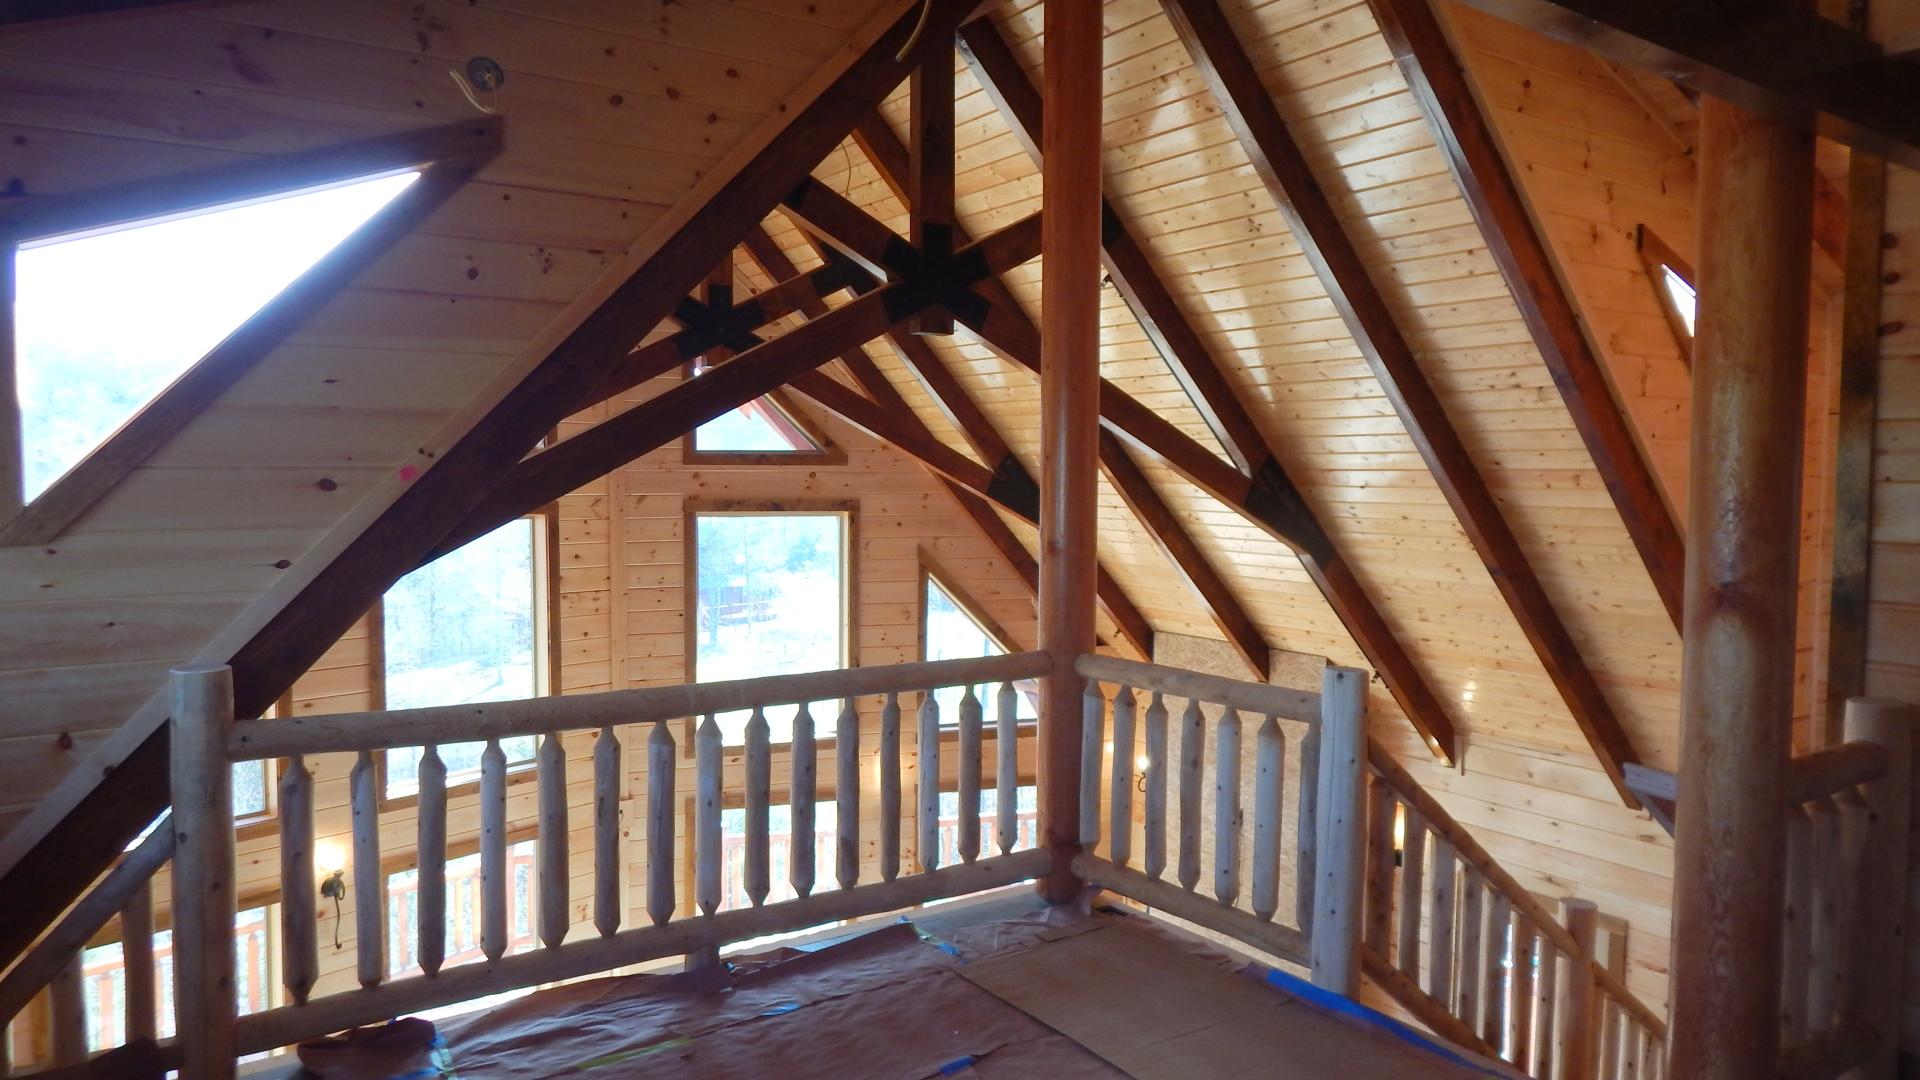 Ridge view lodge game room 5 bd gatlinburg cabin